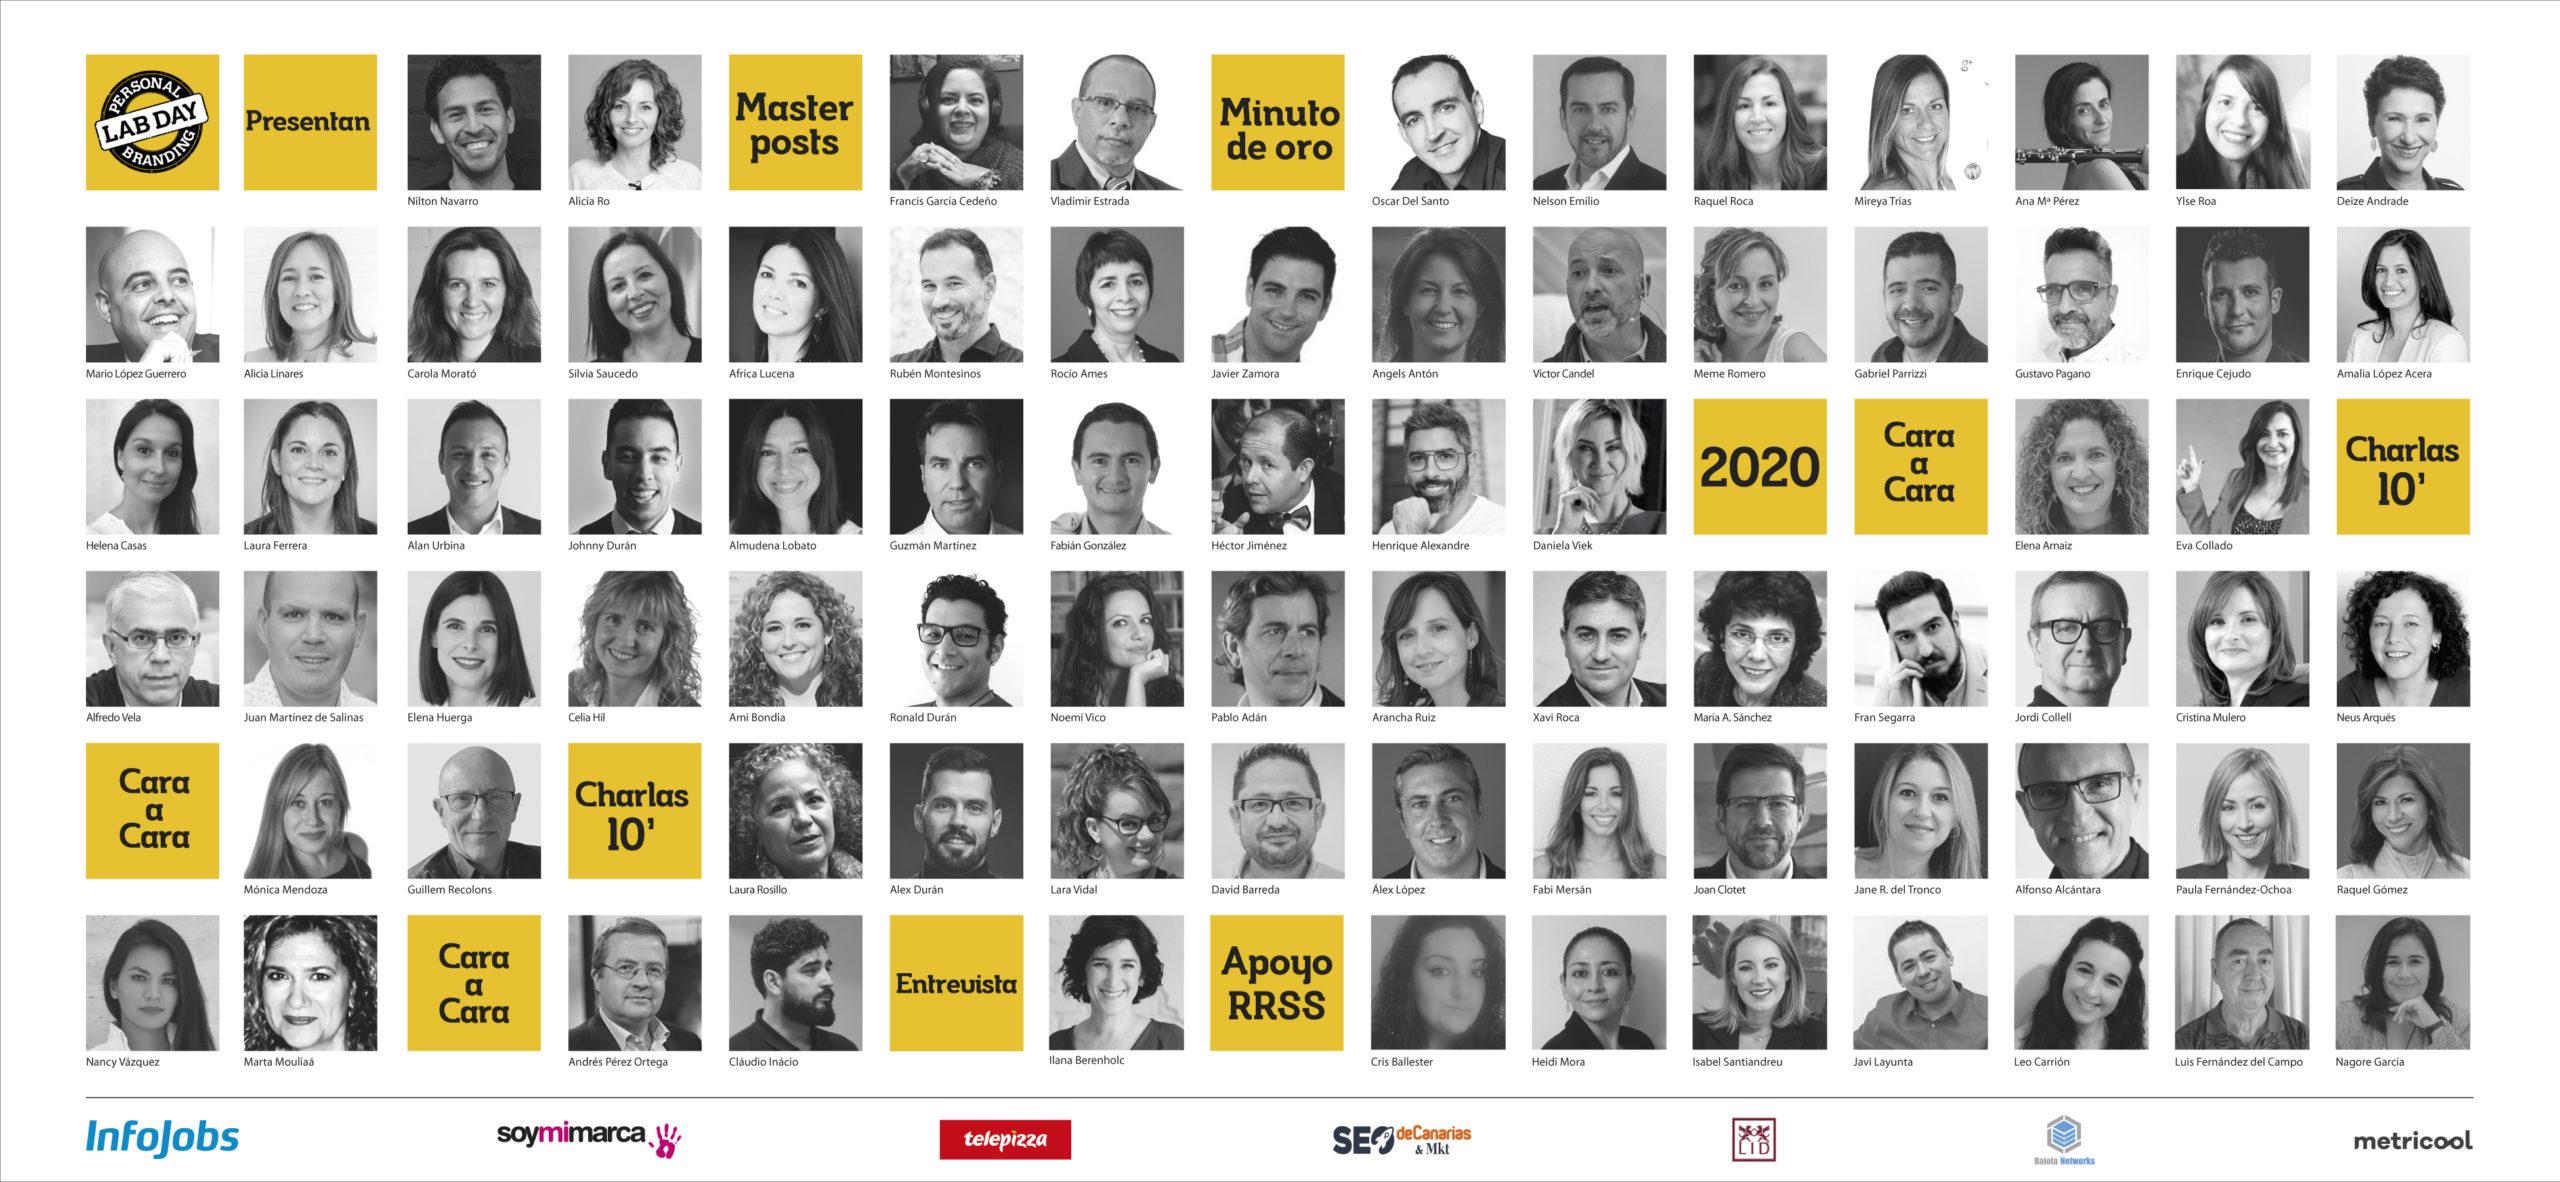 Protagonists #DíaDeLaMarcaPersonal 2020